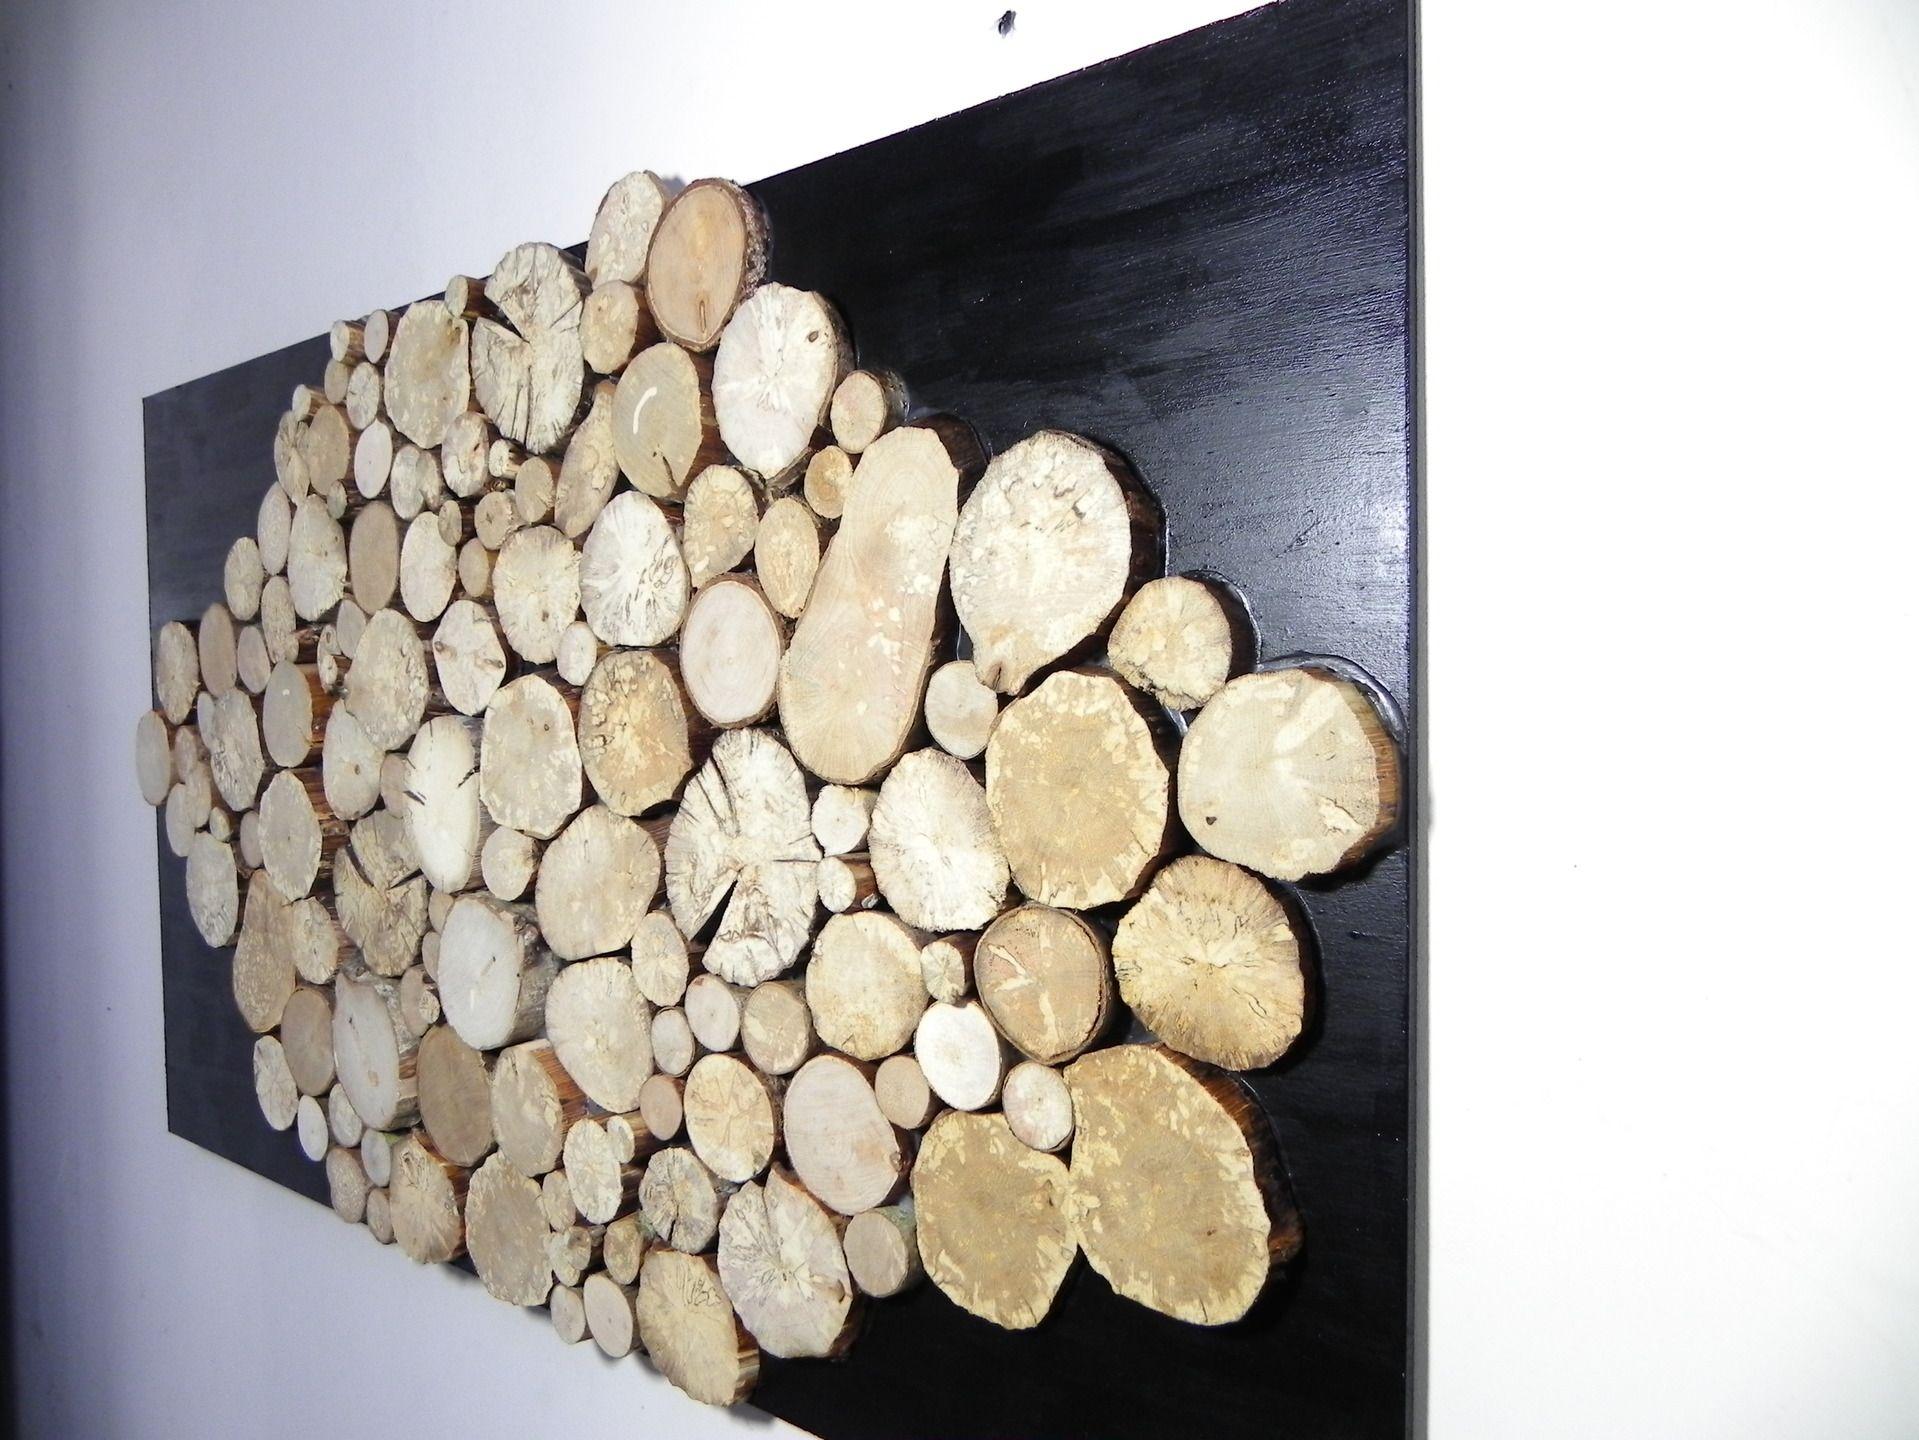 Grand tableau design abstrait en rondelles de bois brut for Grande table bois brut